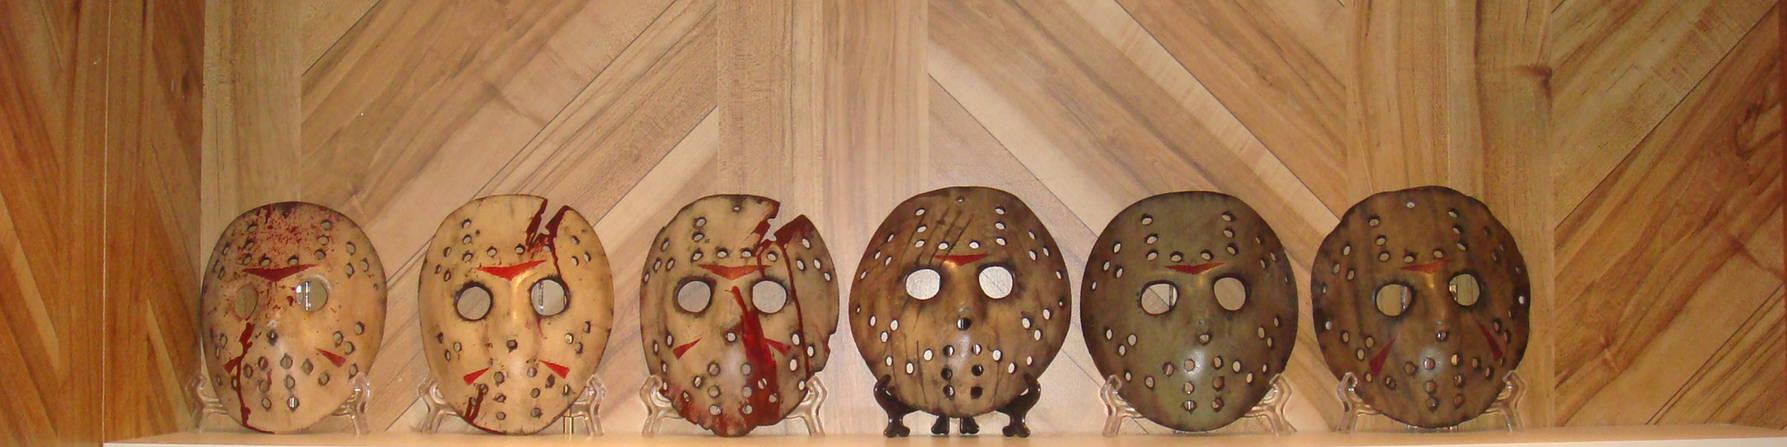 Fiberglass Jason Mask Friday the 13th